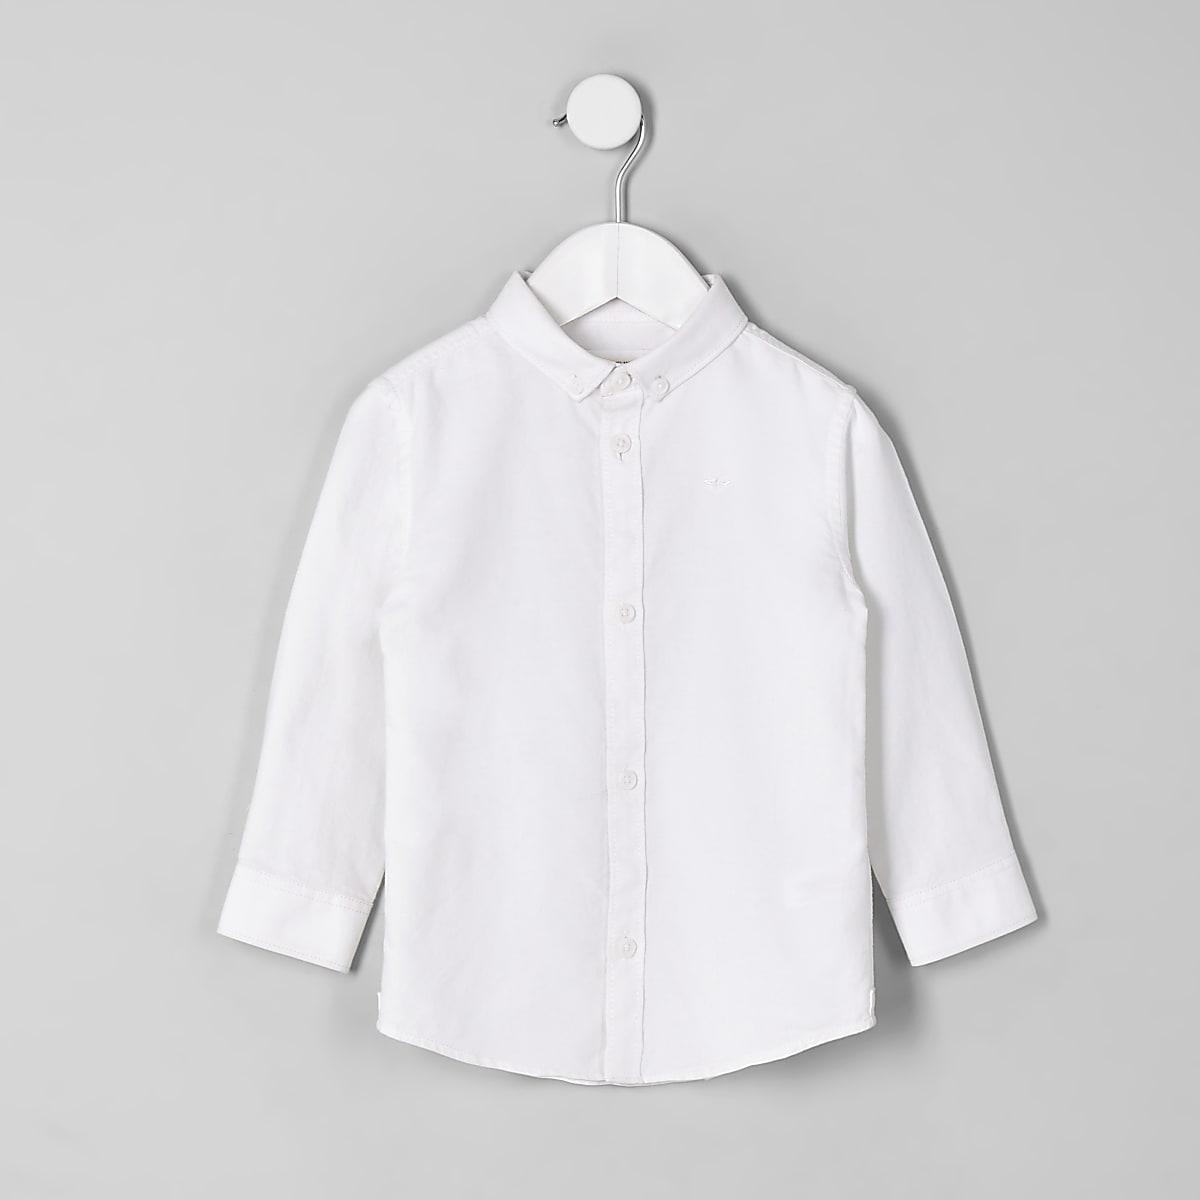 Mini boys white button-down collar shirt